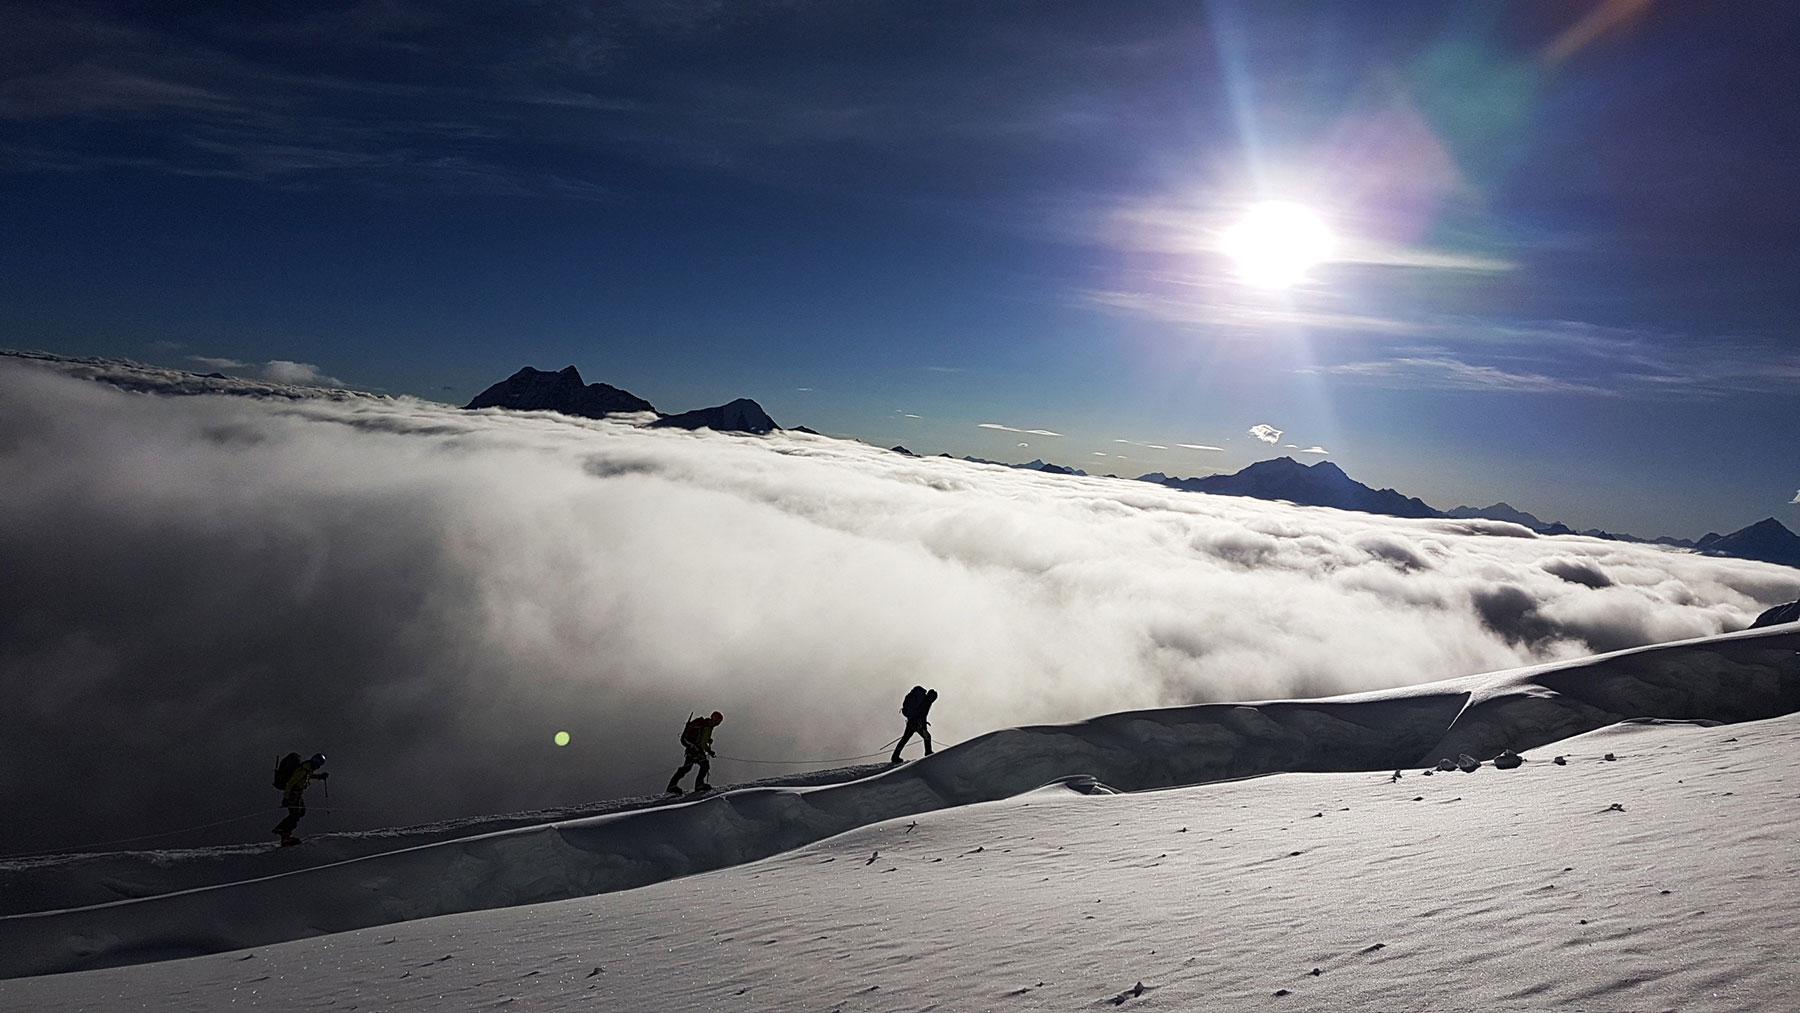 Expedition on Manaslu 8163m